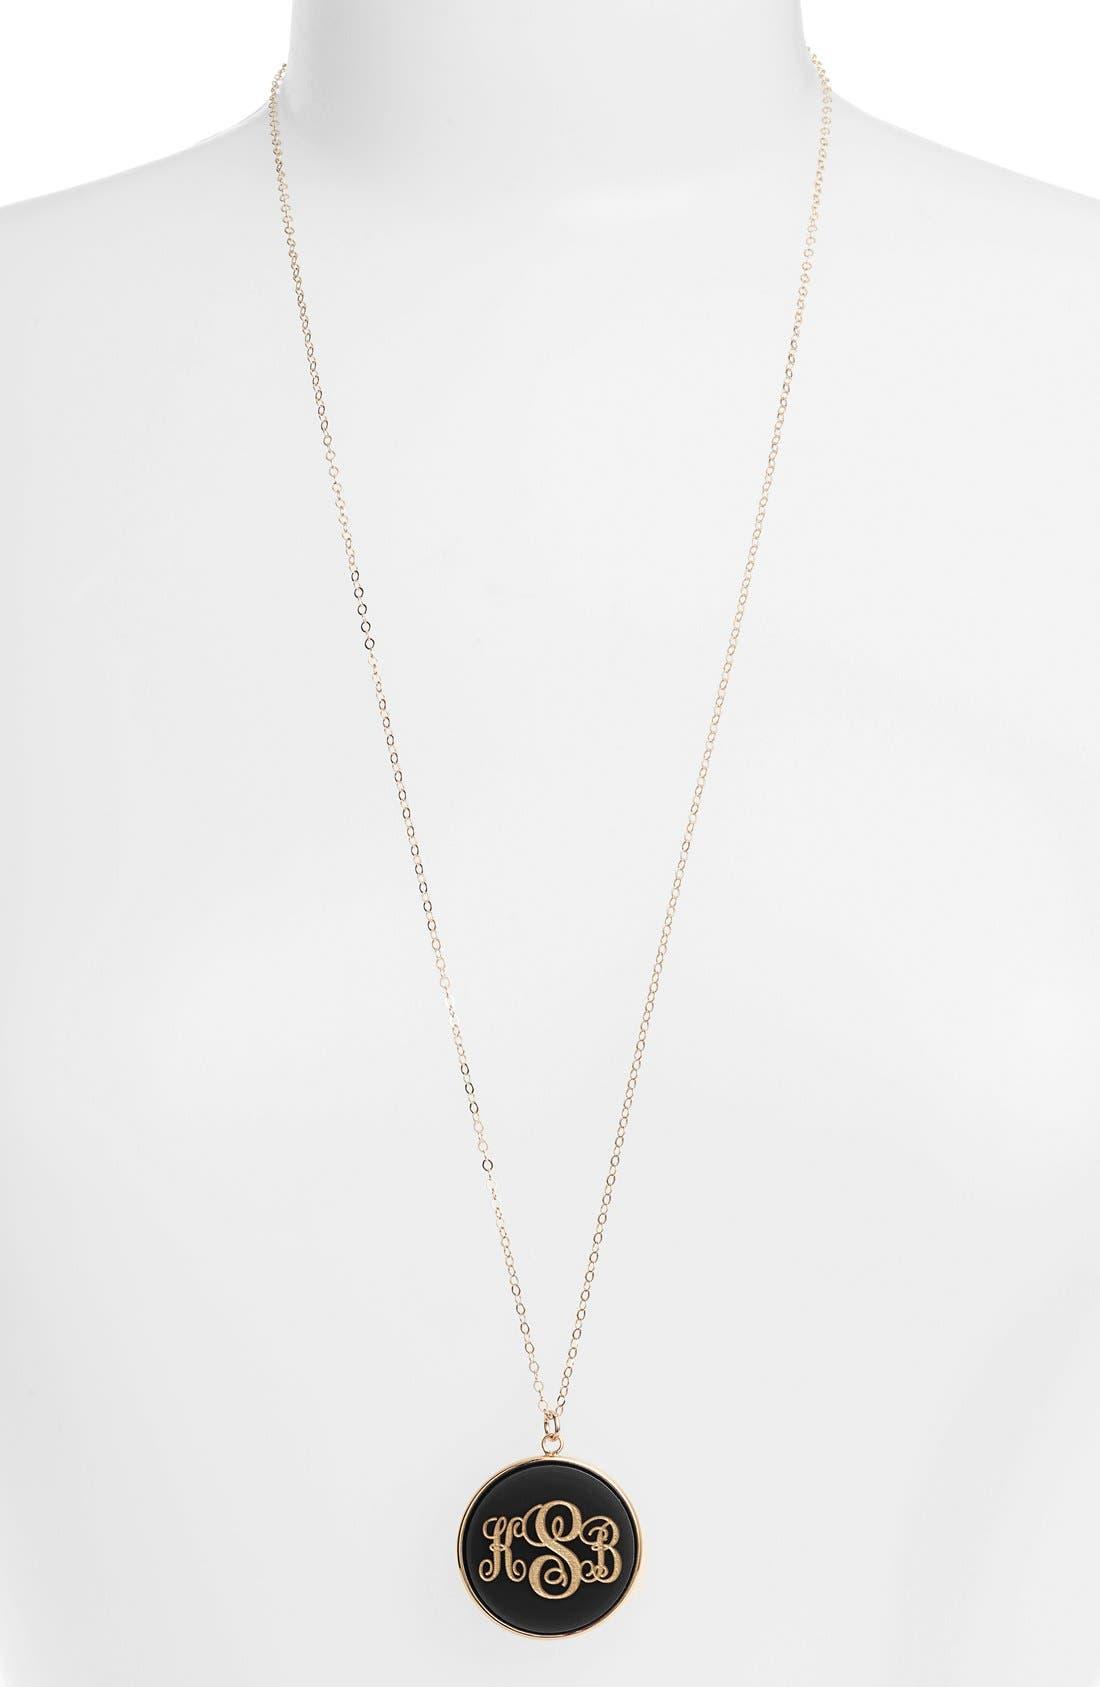 'Vineyard' Personalized Monogram Pendant Necklace,                             Main thumbnail 1, color,                             Black